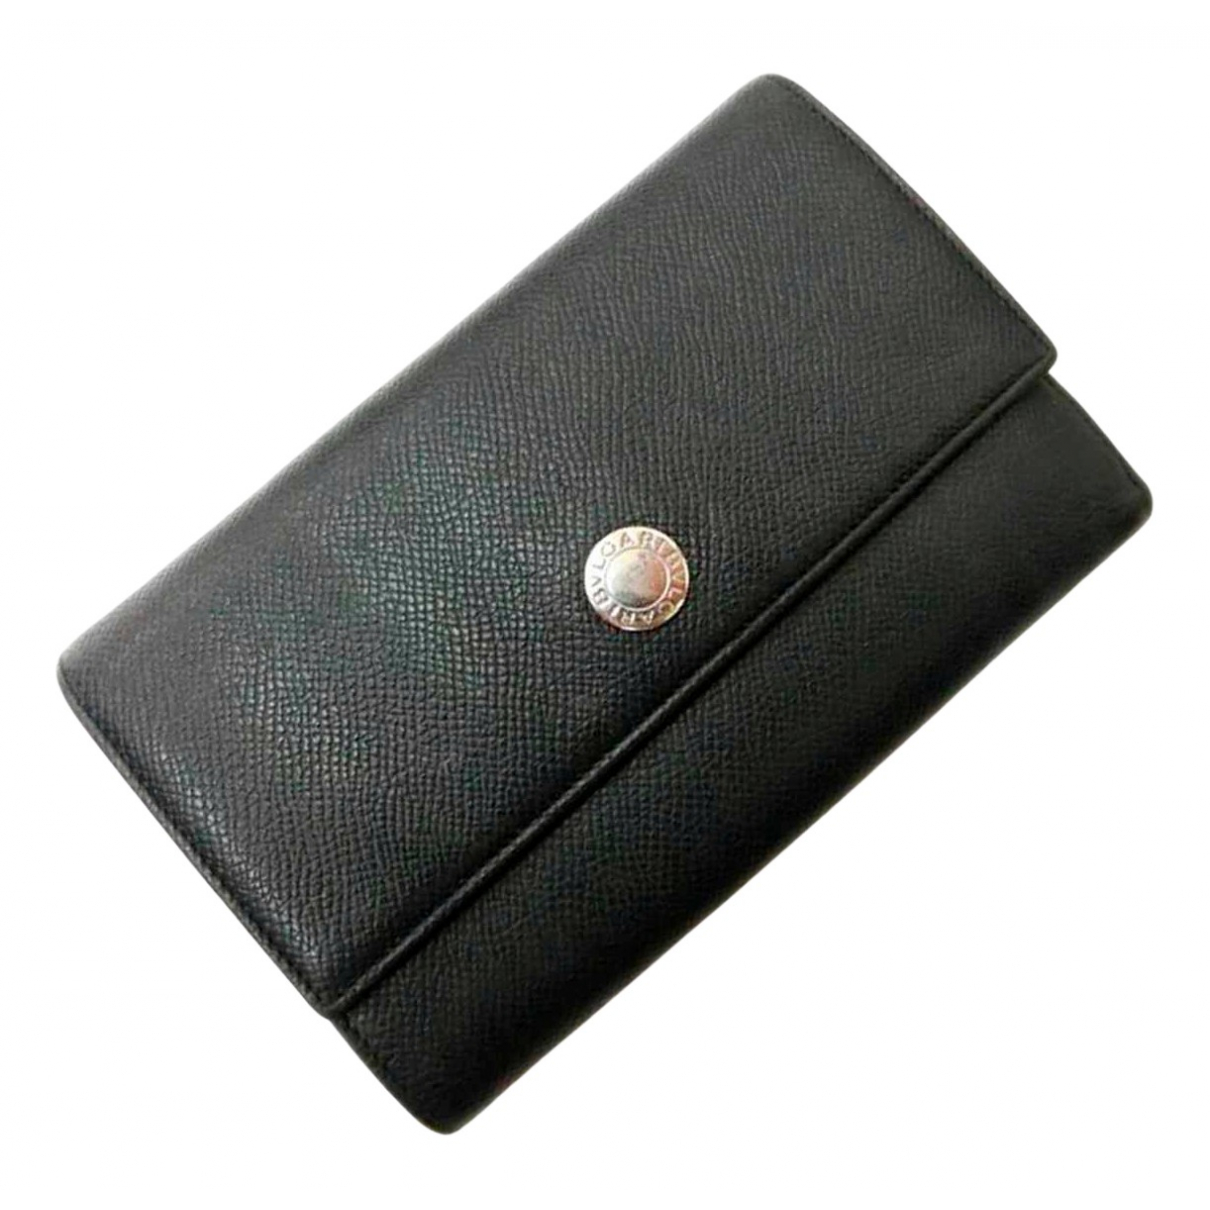 Bvlgari \N Portemonnaie in  Schwarz Leder